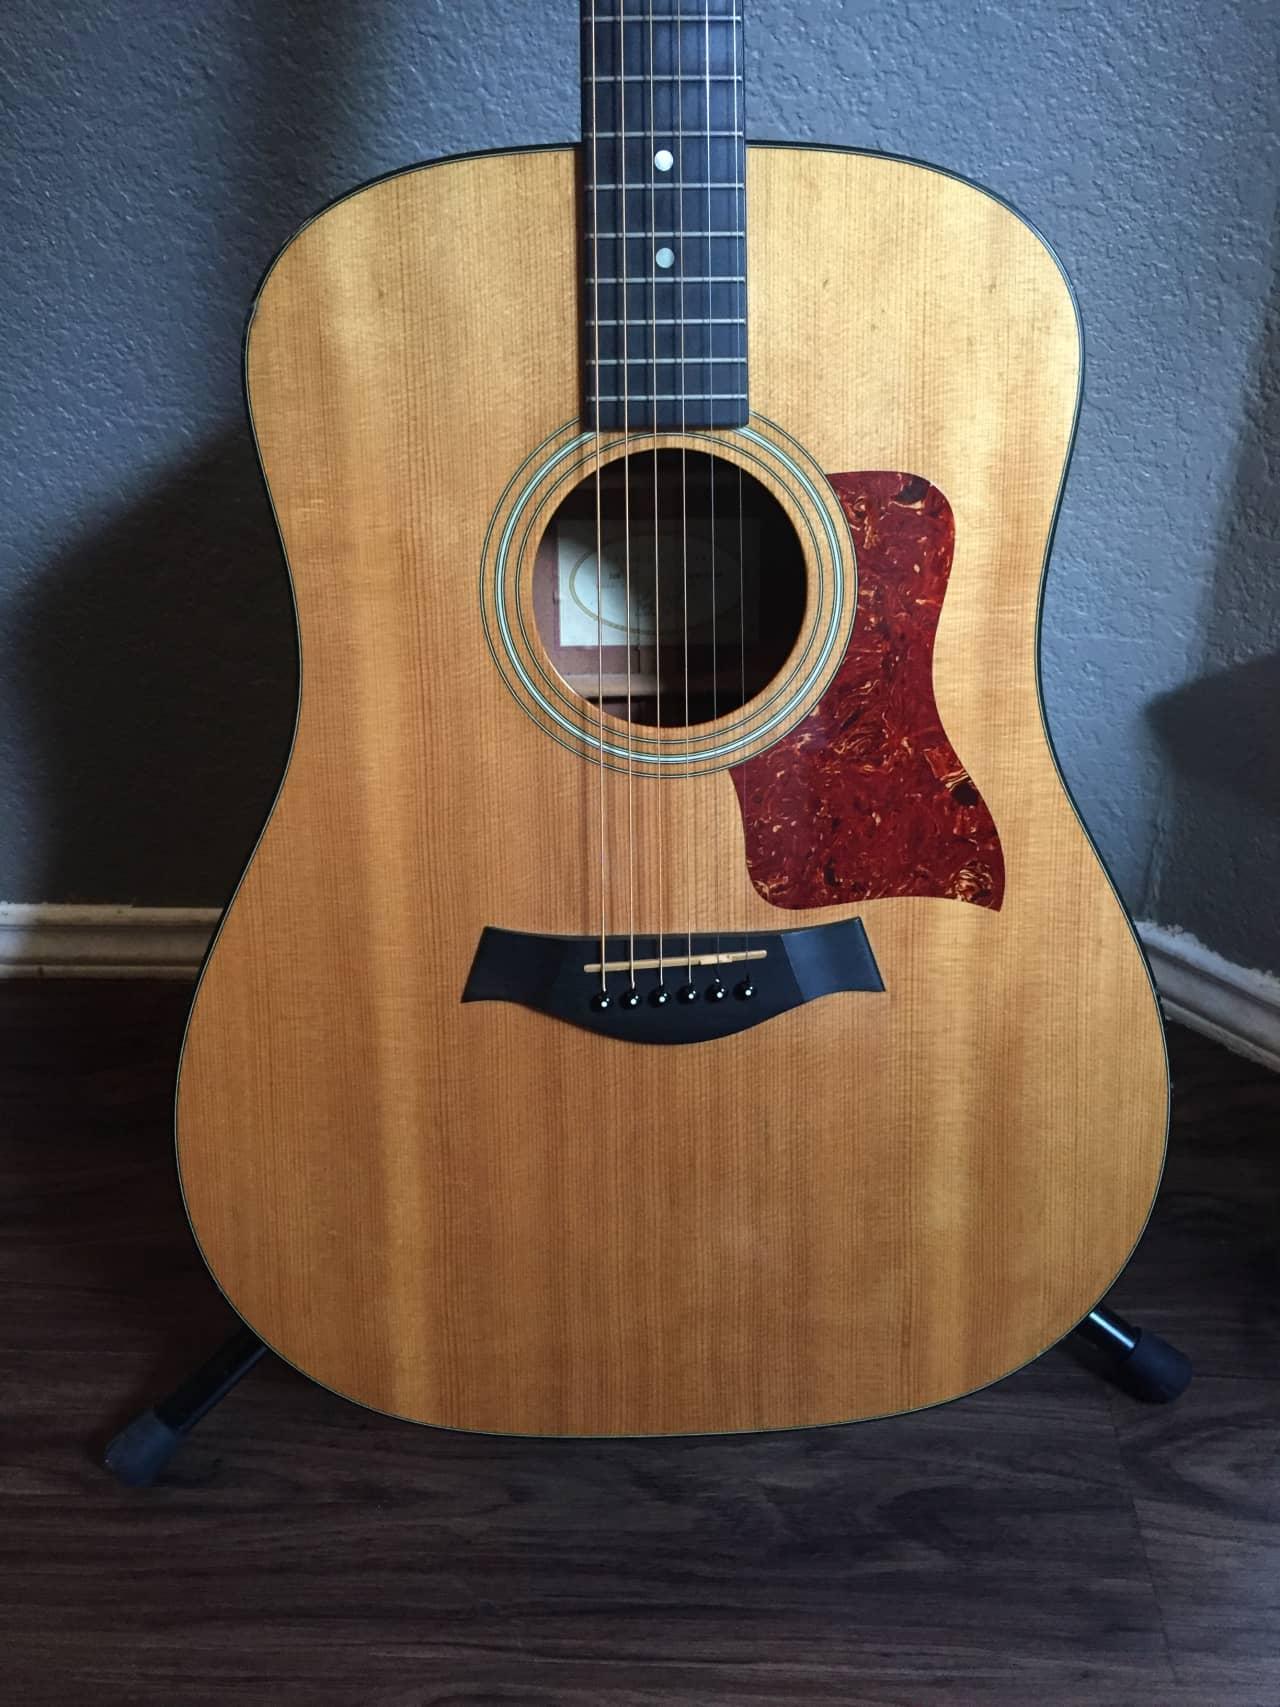 taylor 310 acoustic guitar w hardcase awesome used guitar reverb. Black Bedroom Furniture Sets. Home Design Ideas